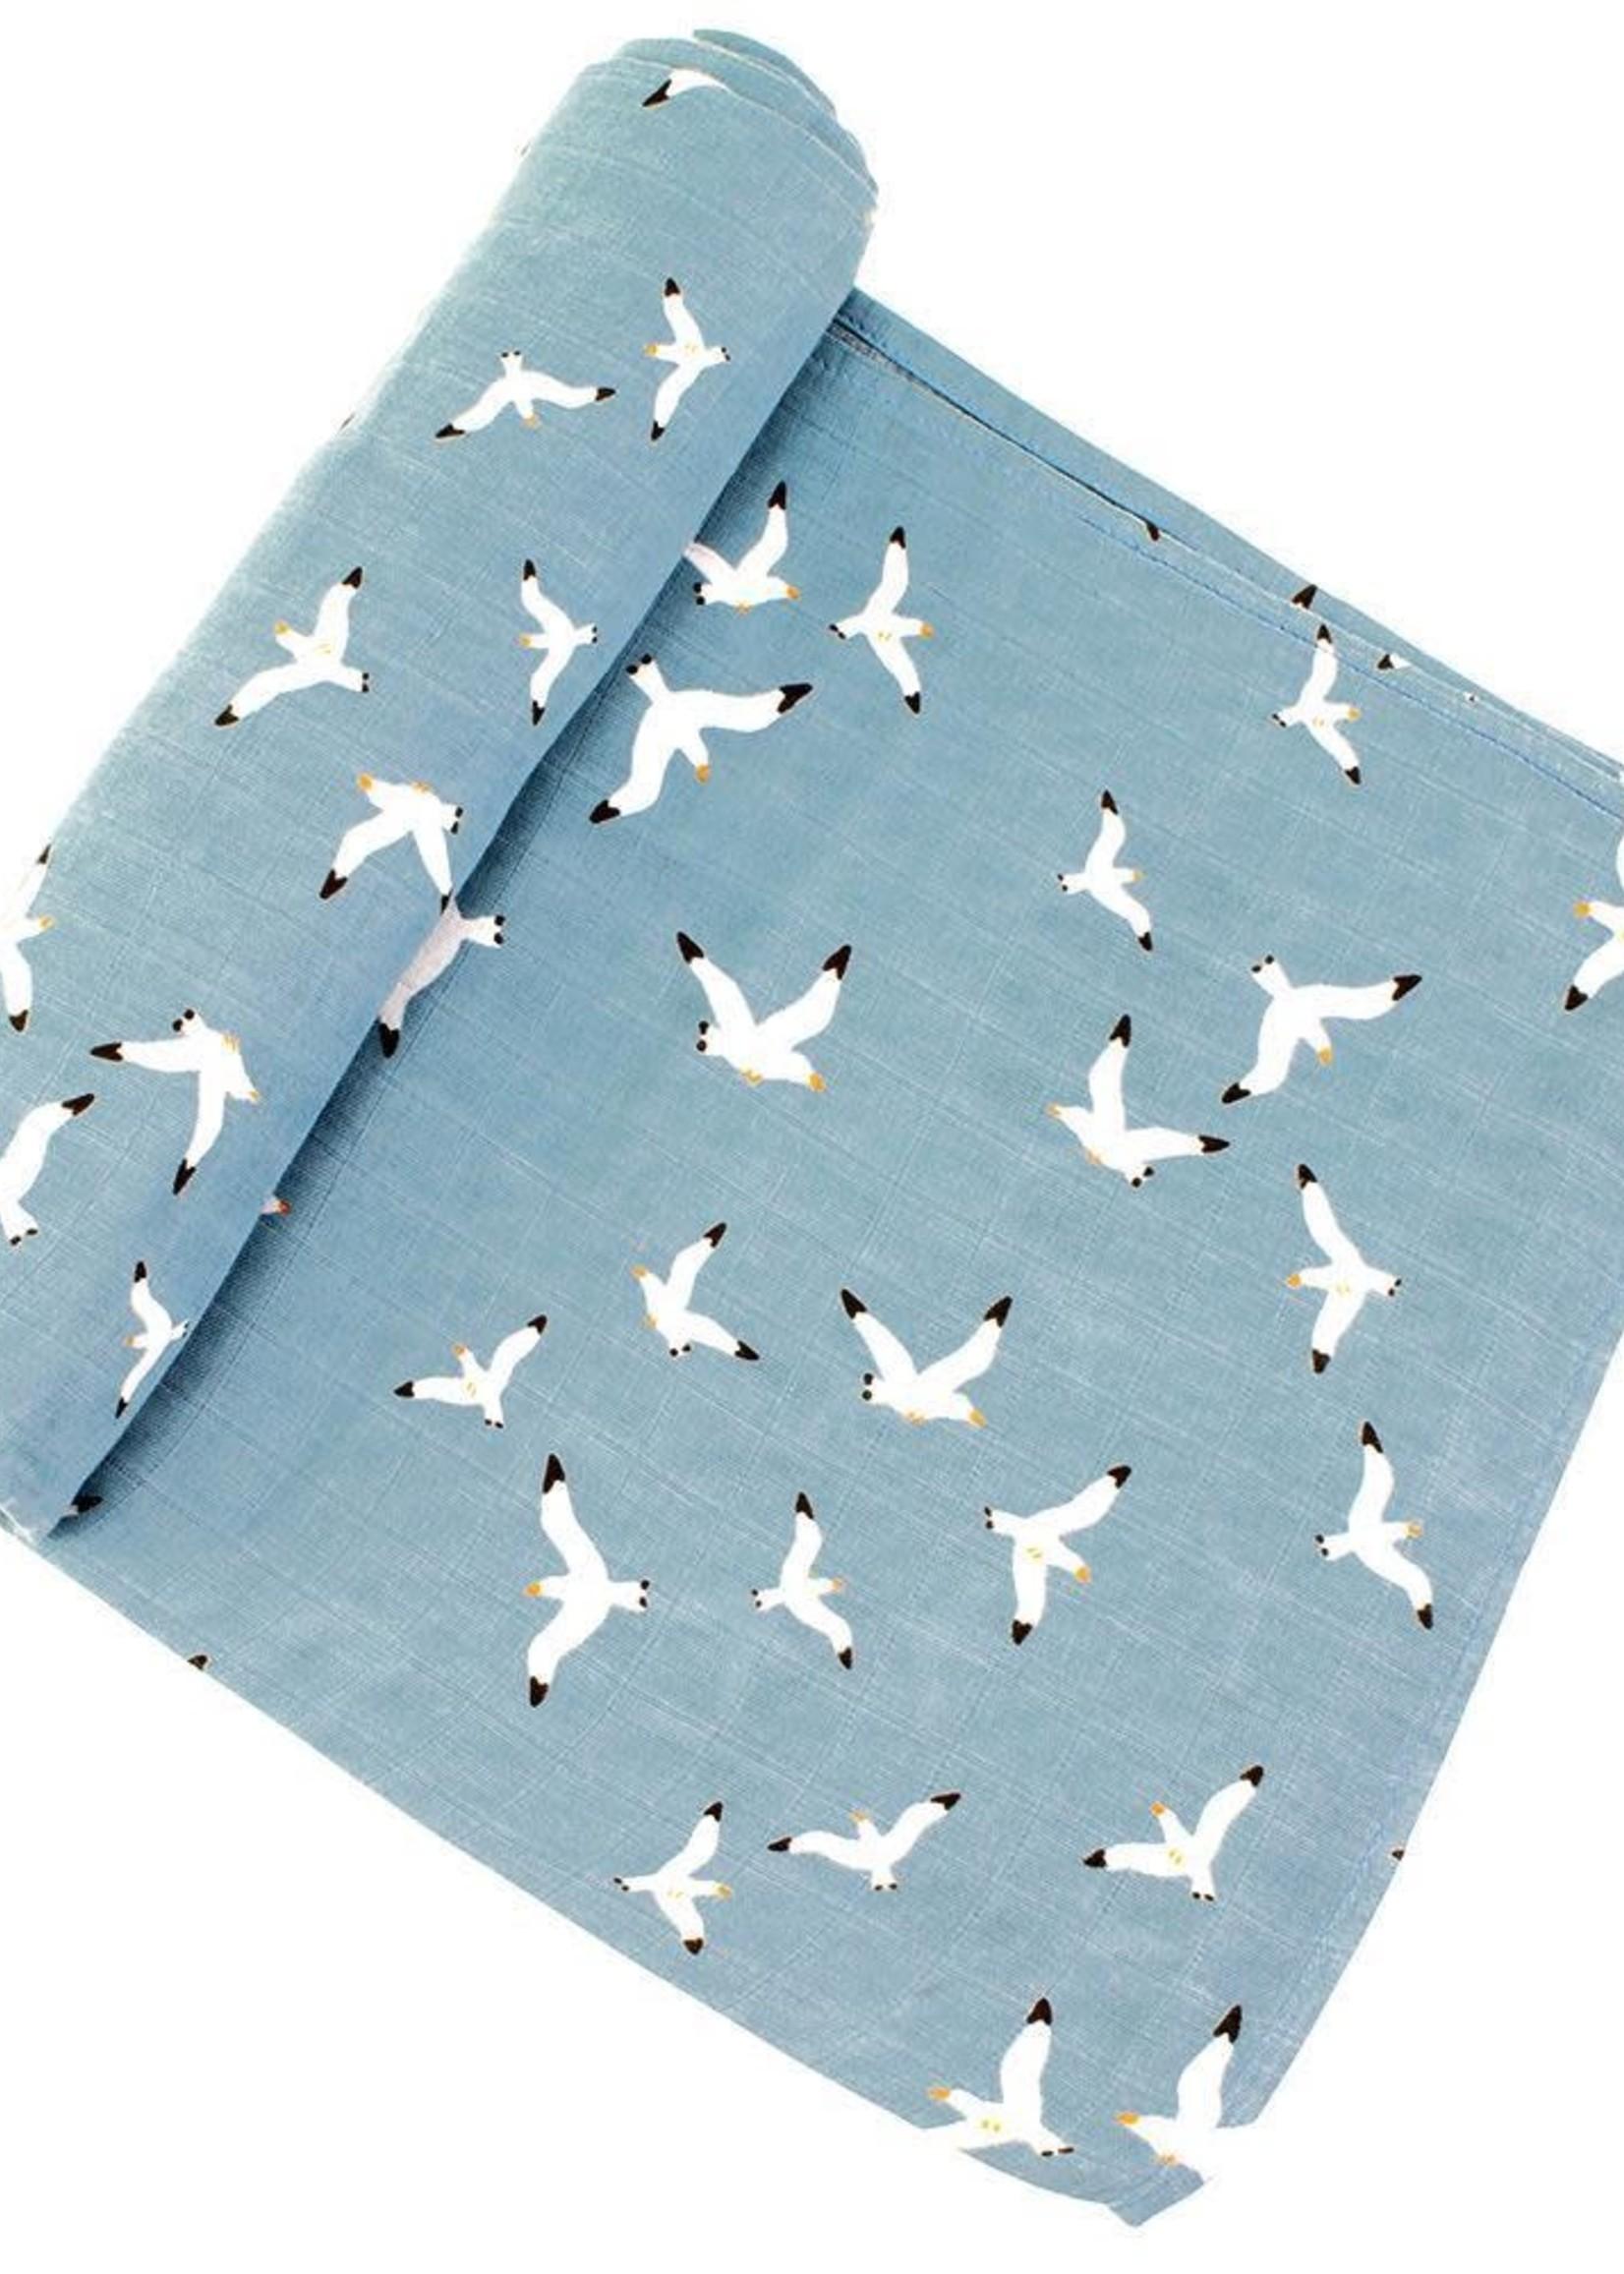 Bebe Au Lait Seagulls Oh-So-Soft Muslin Swaddle Blanket